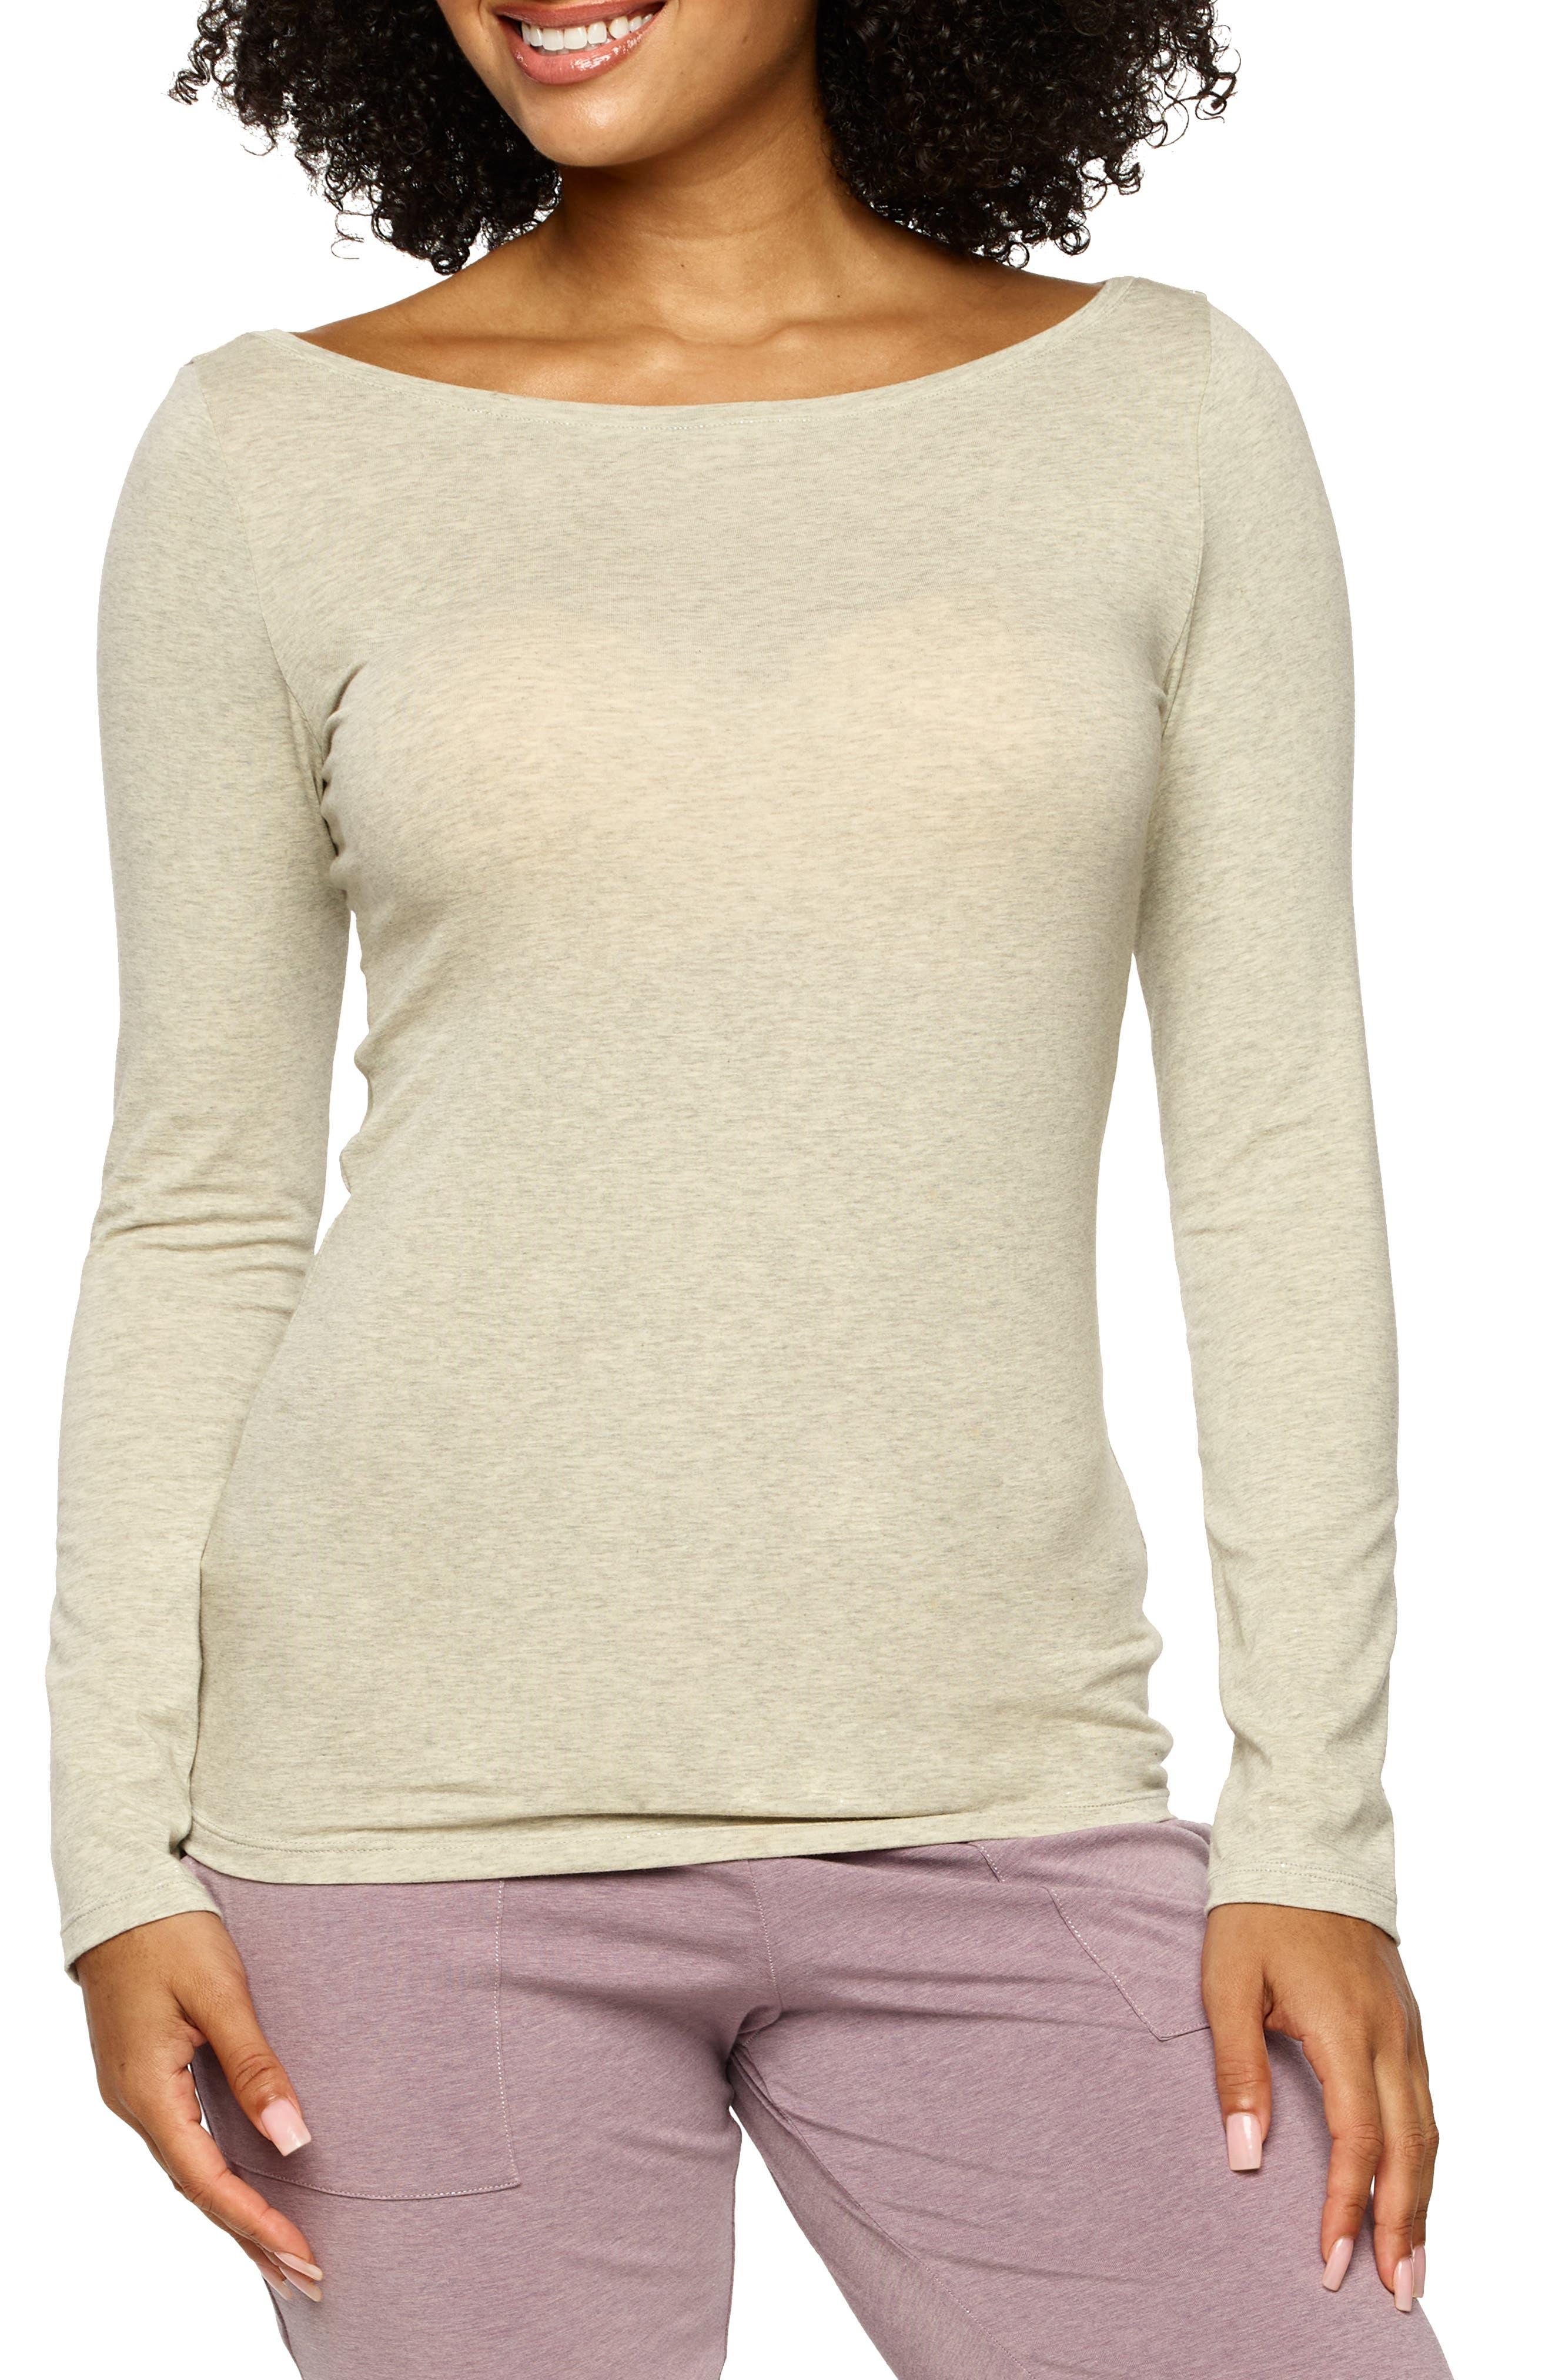 Organics Long Sleeve T-Shirt